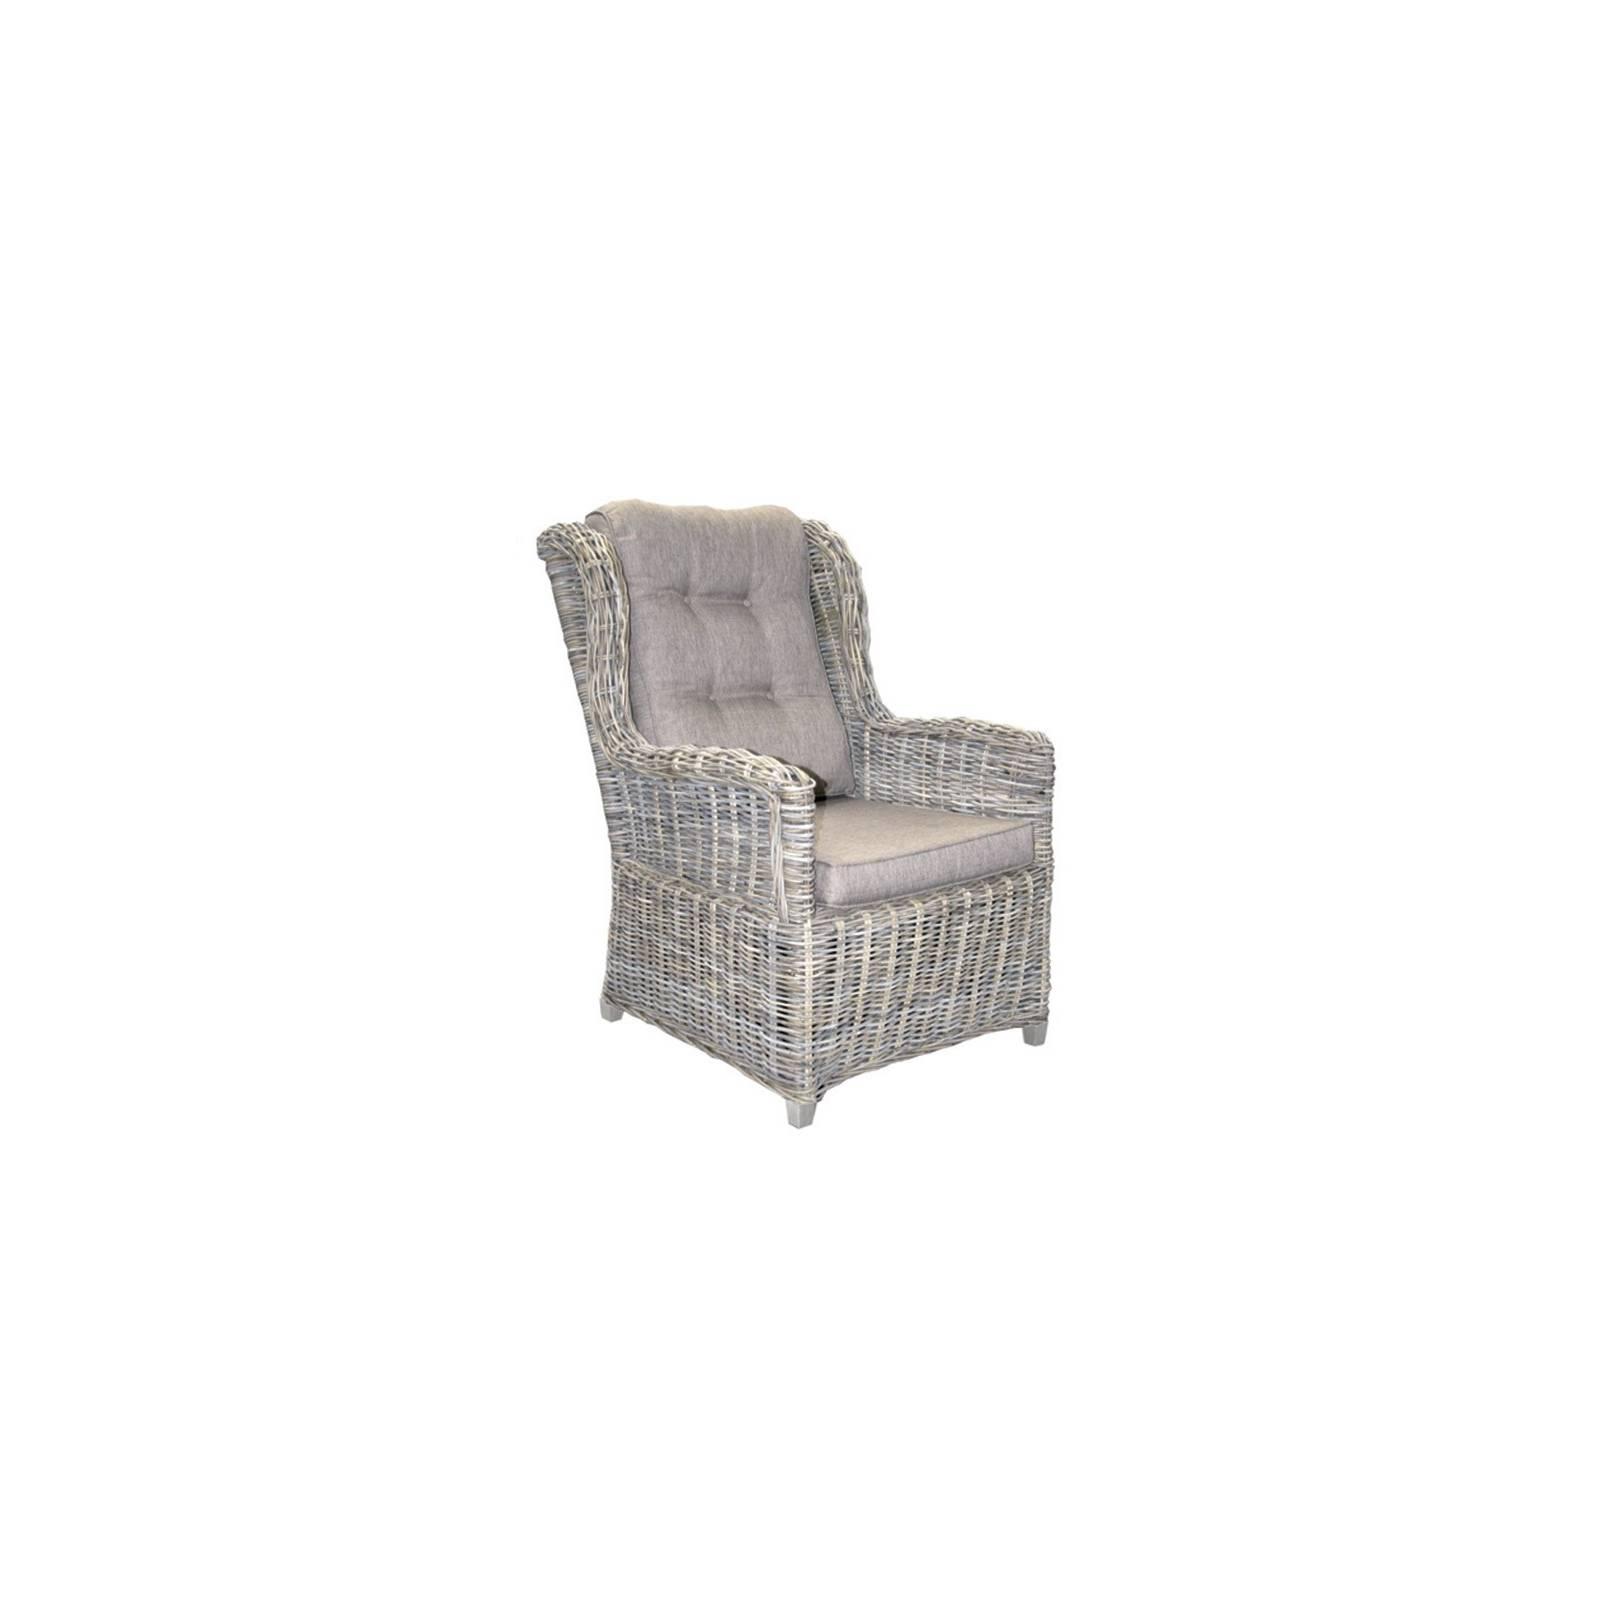 fauteuil bridge en rotin jacob - meuble pour la véranda